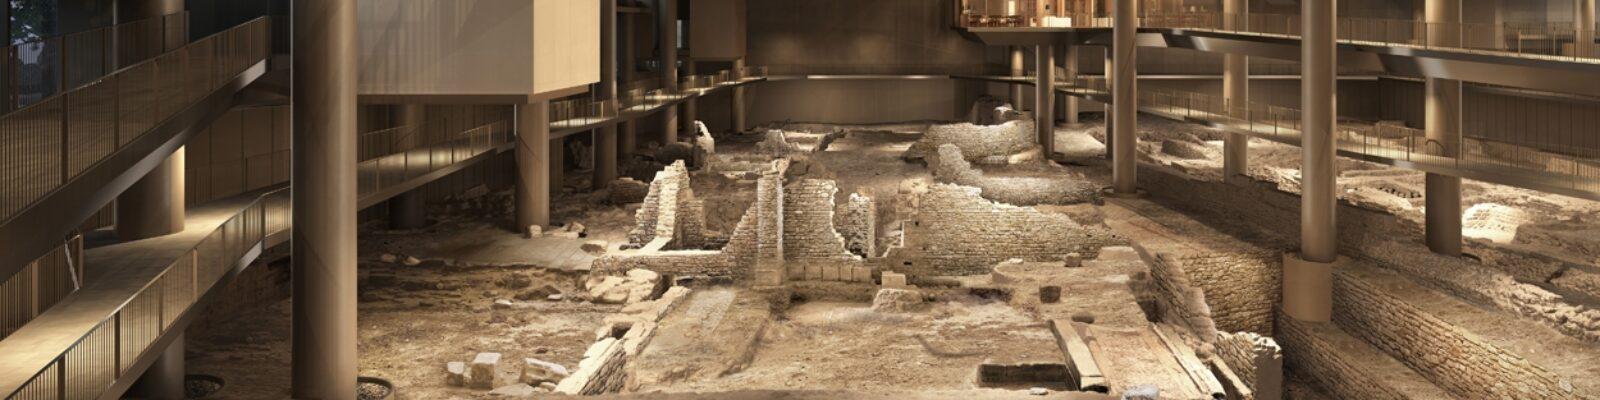 Hotel Lighting: Antakya Museum Hotel